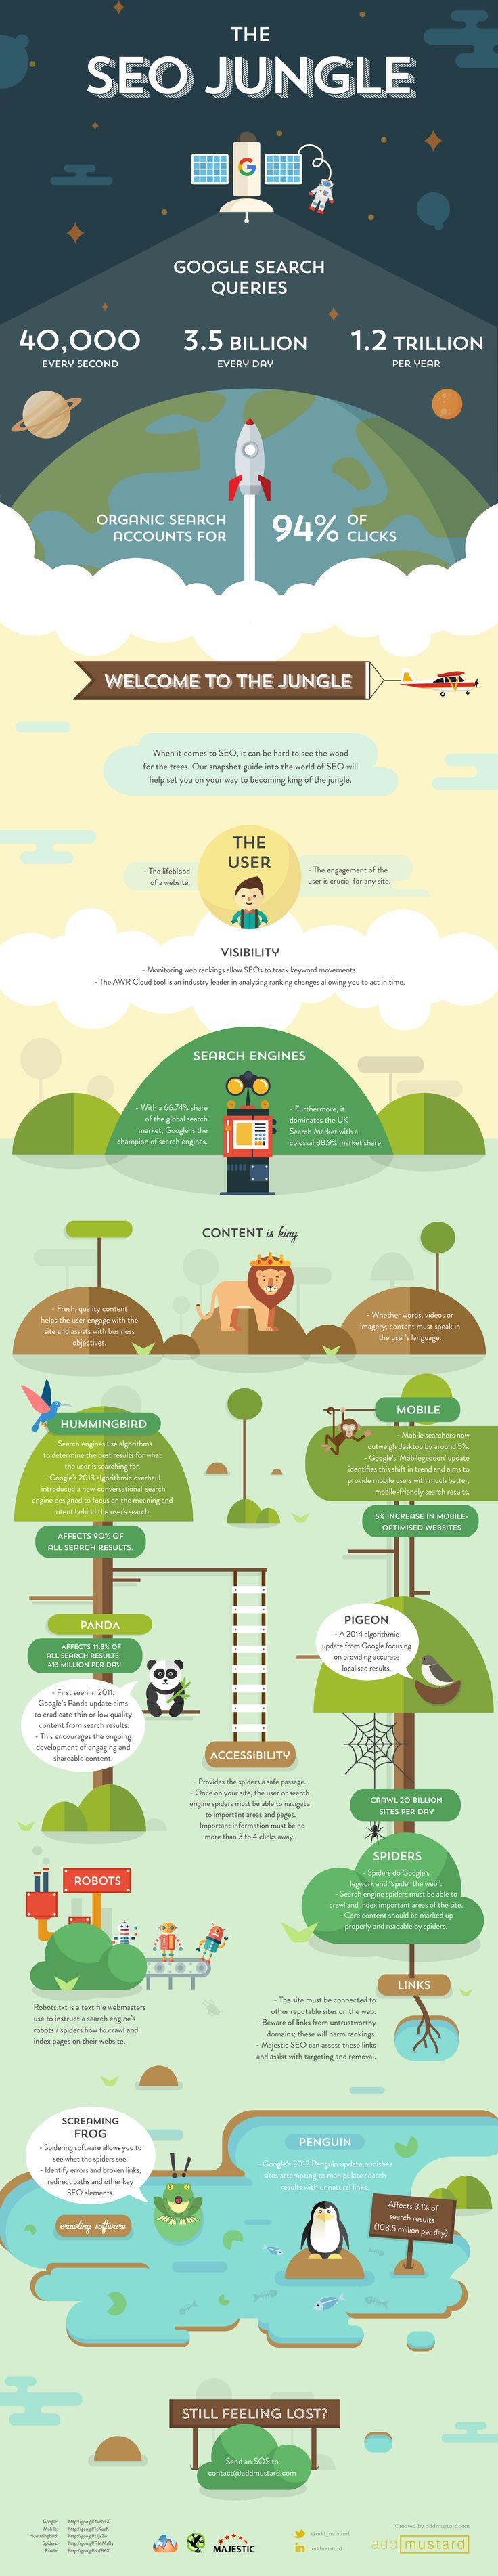 Navigating The Wild Jungle Of SEO #SEO #GoogleSearch #GoogleSearchQueries